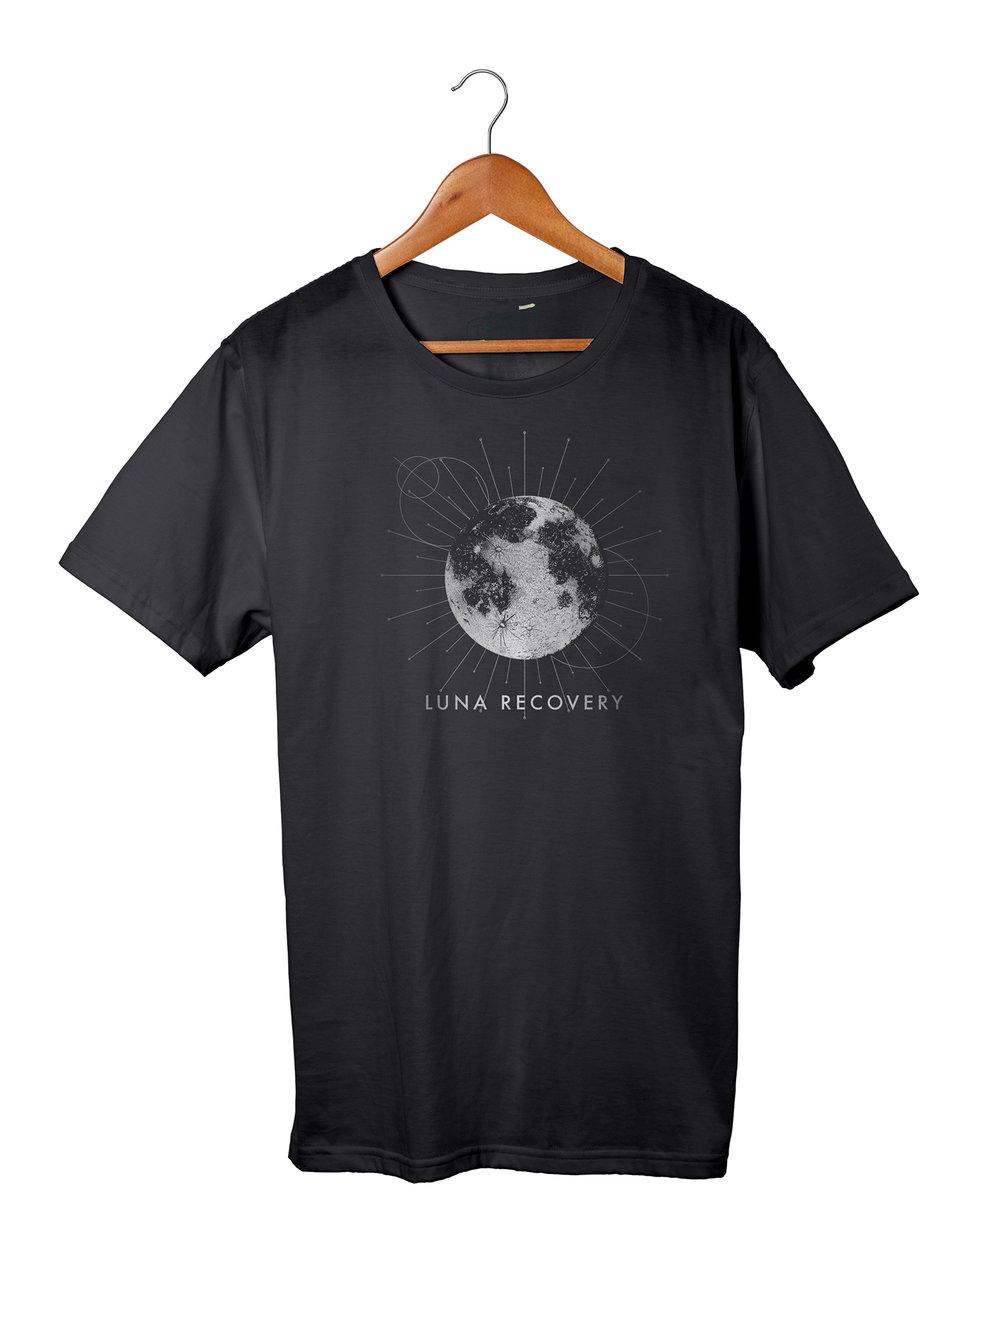 Luna_T-Shirt-Hanging-Mockup.jpg